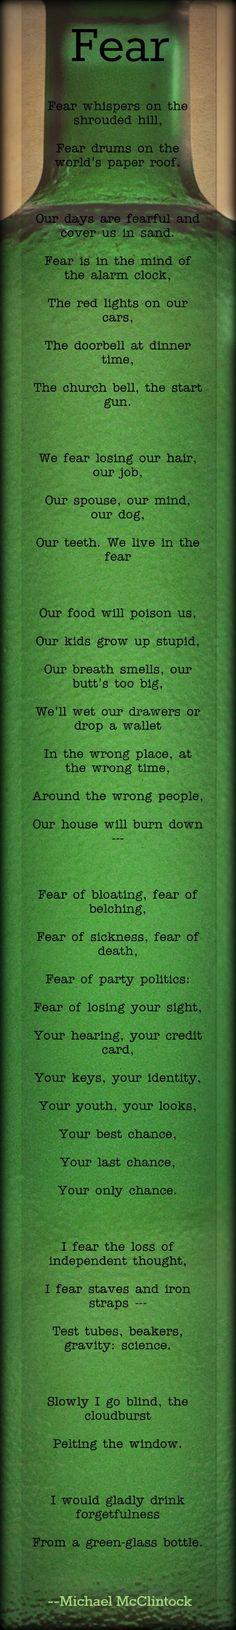 Poem: Fear -- by Michael McClintock @ Michael McClintock Poet on Pinterest...